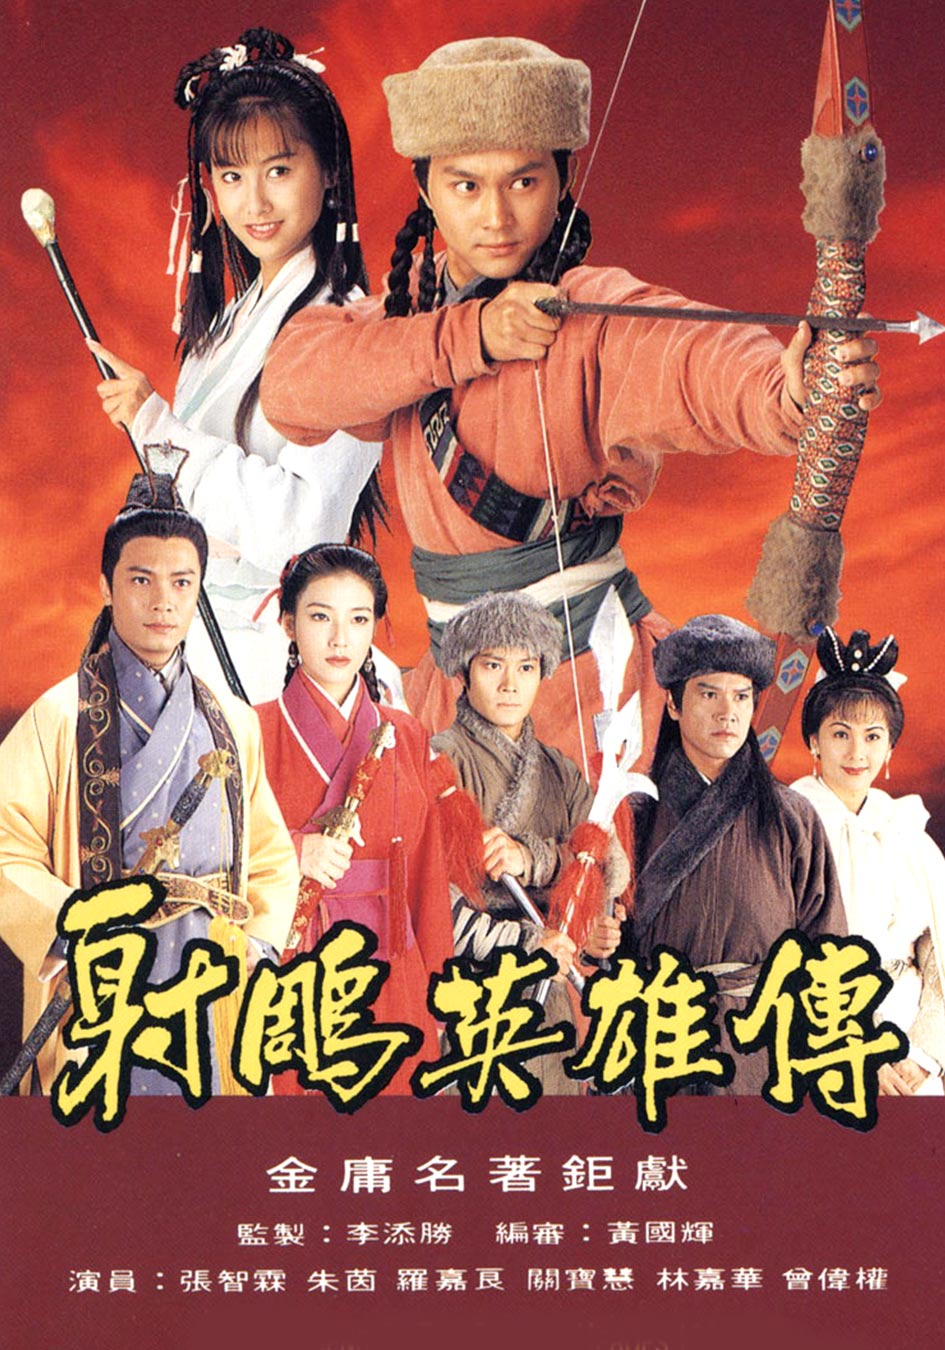 射鵰英雄傳1994-Legend Of The Condor Heroes 1994